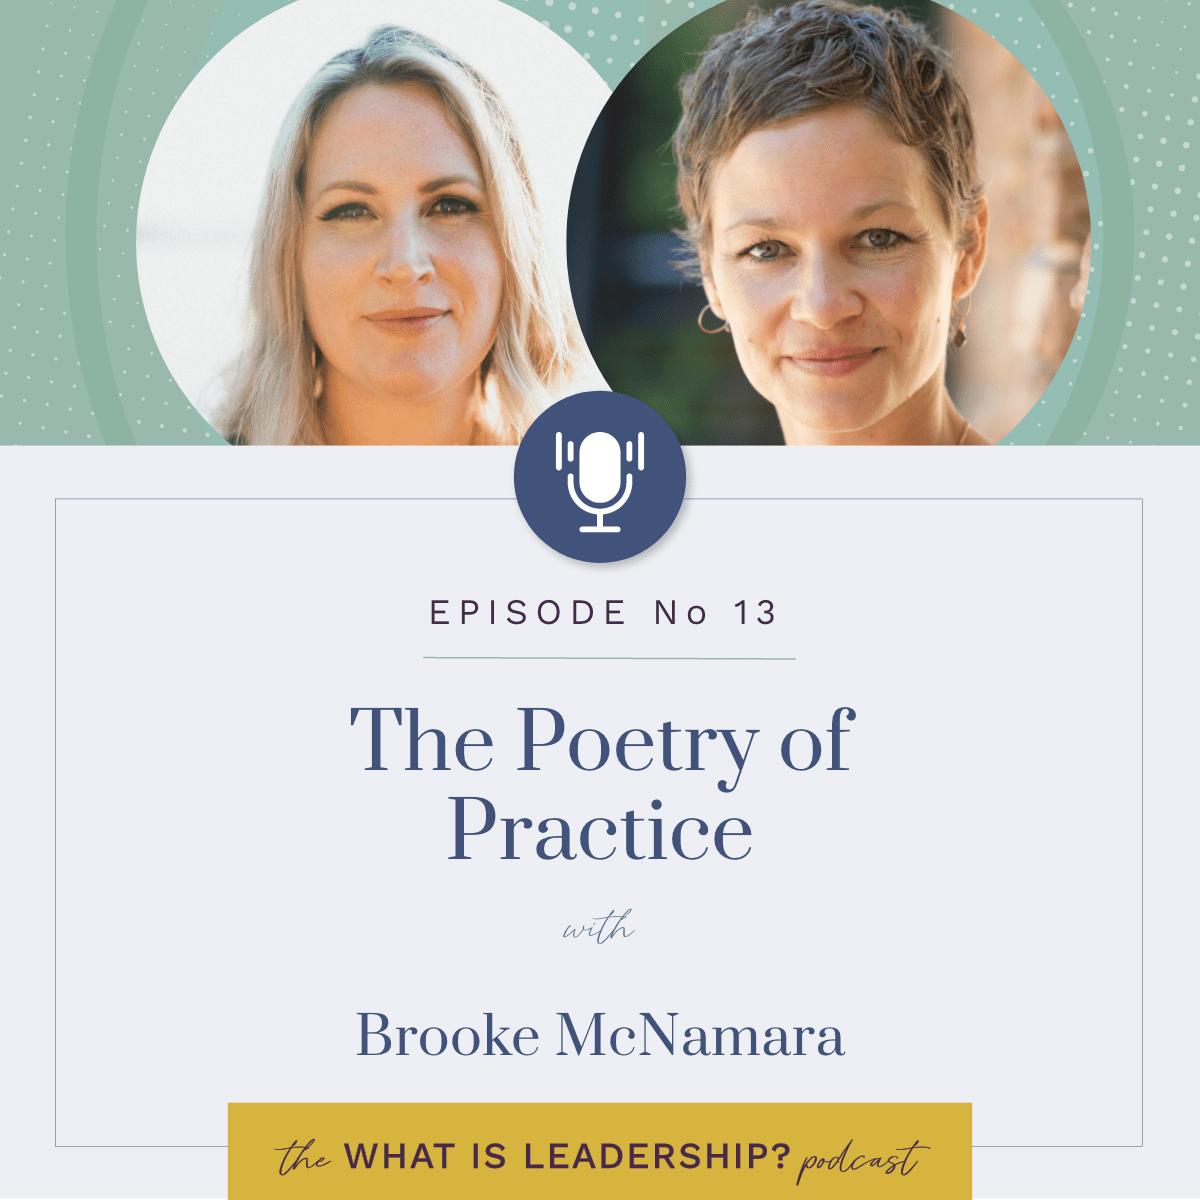 13 – The Poetry of Practice with Brooke McNamara